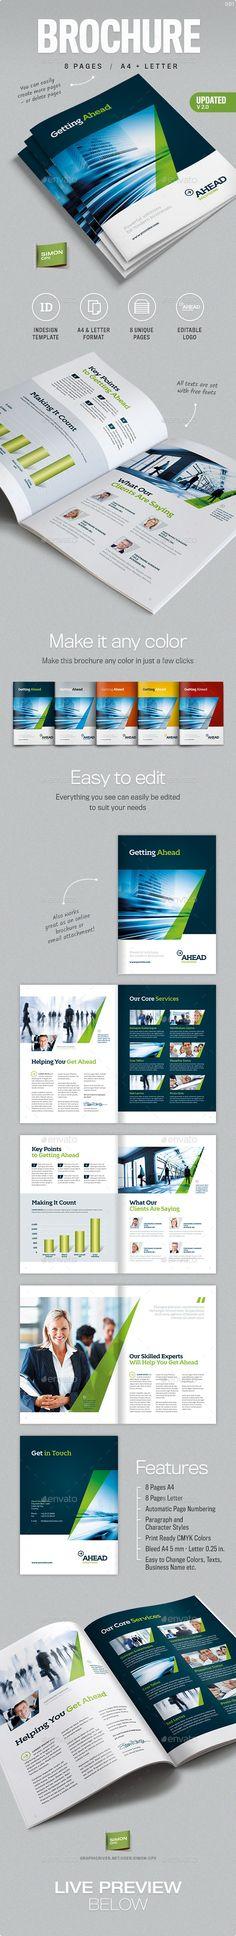 Company Profile Brochure - Corporate Brochures   Brochure Templates ...